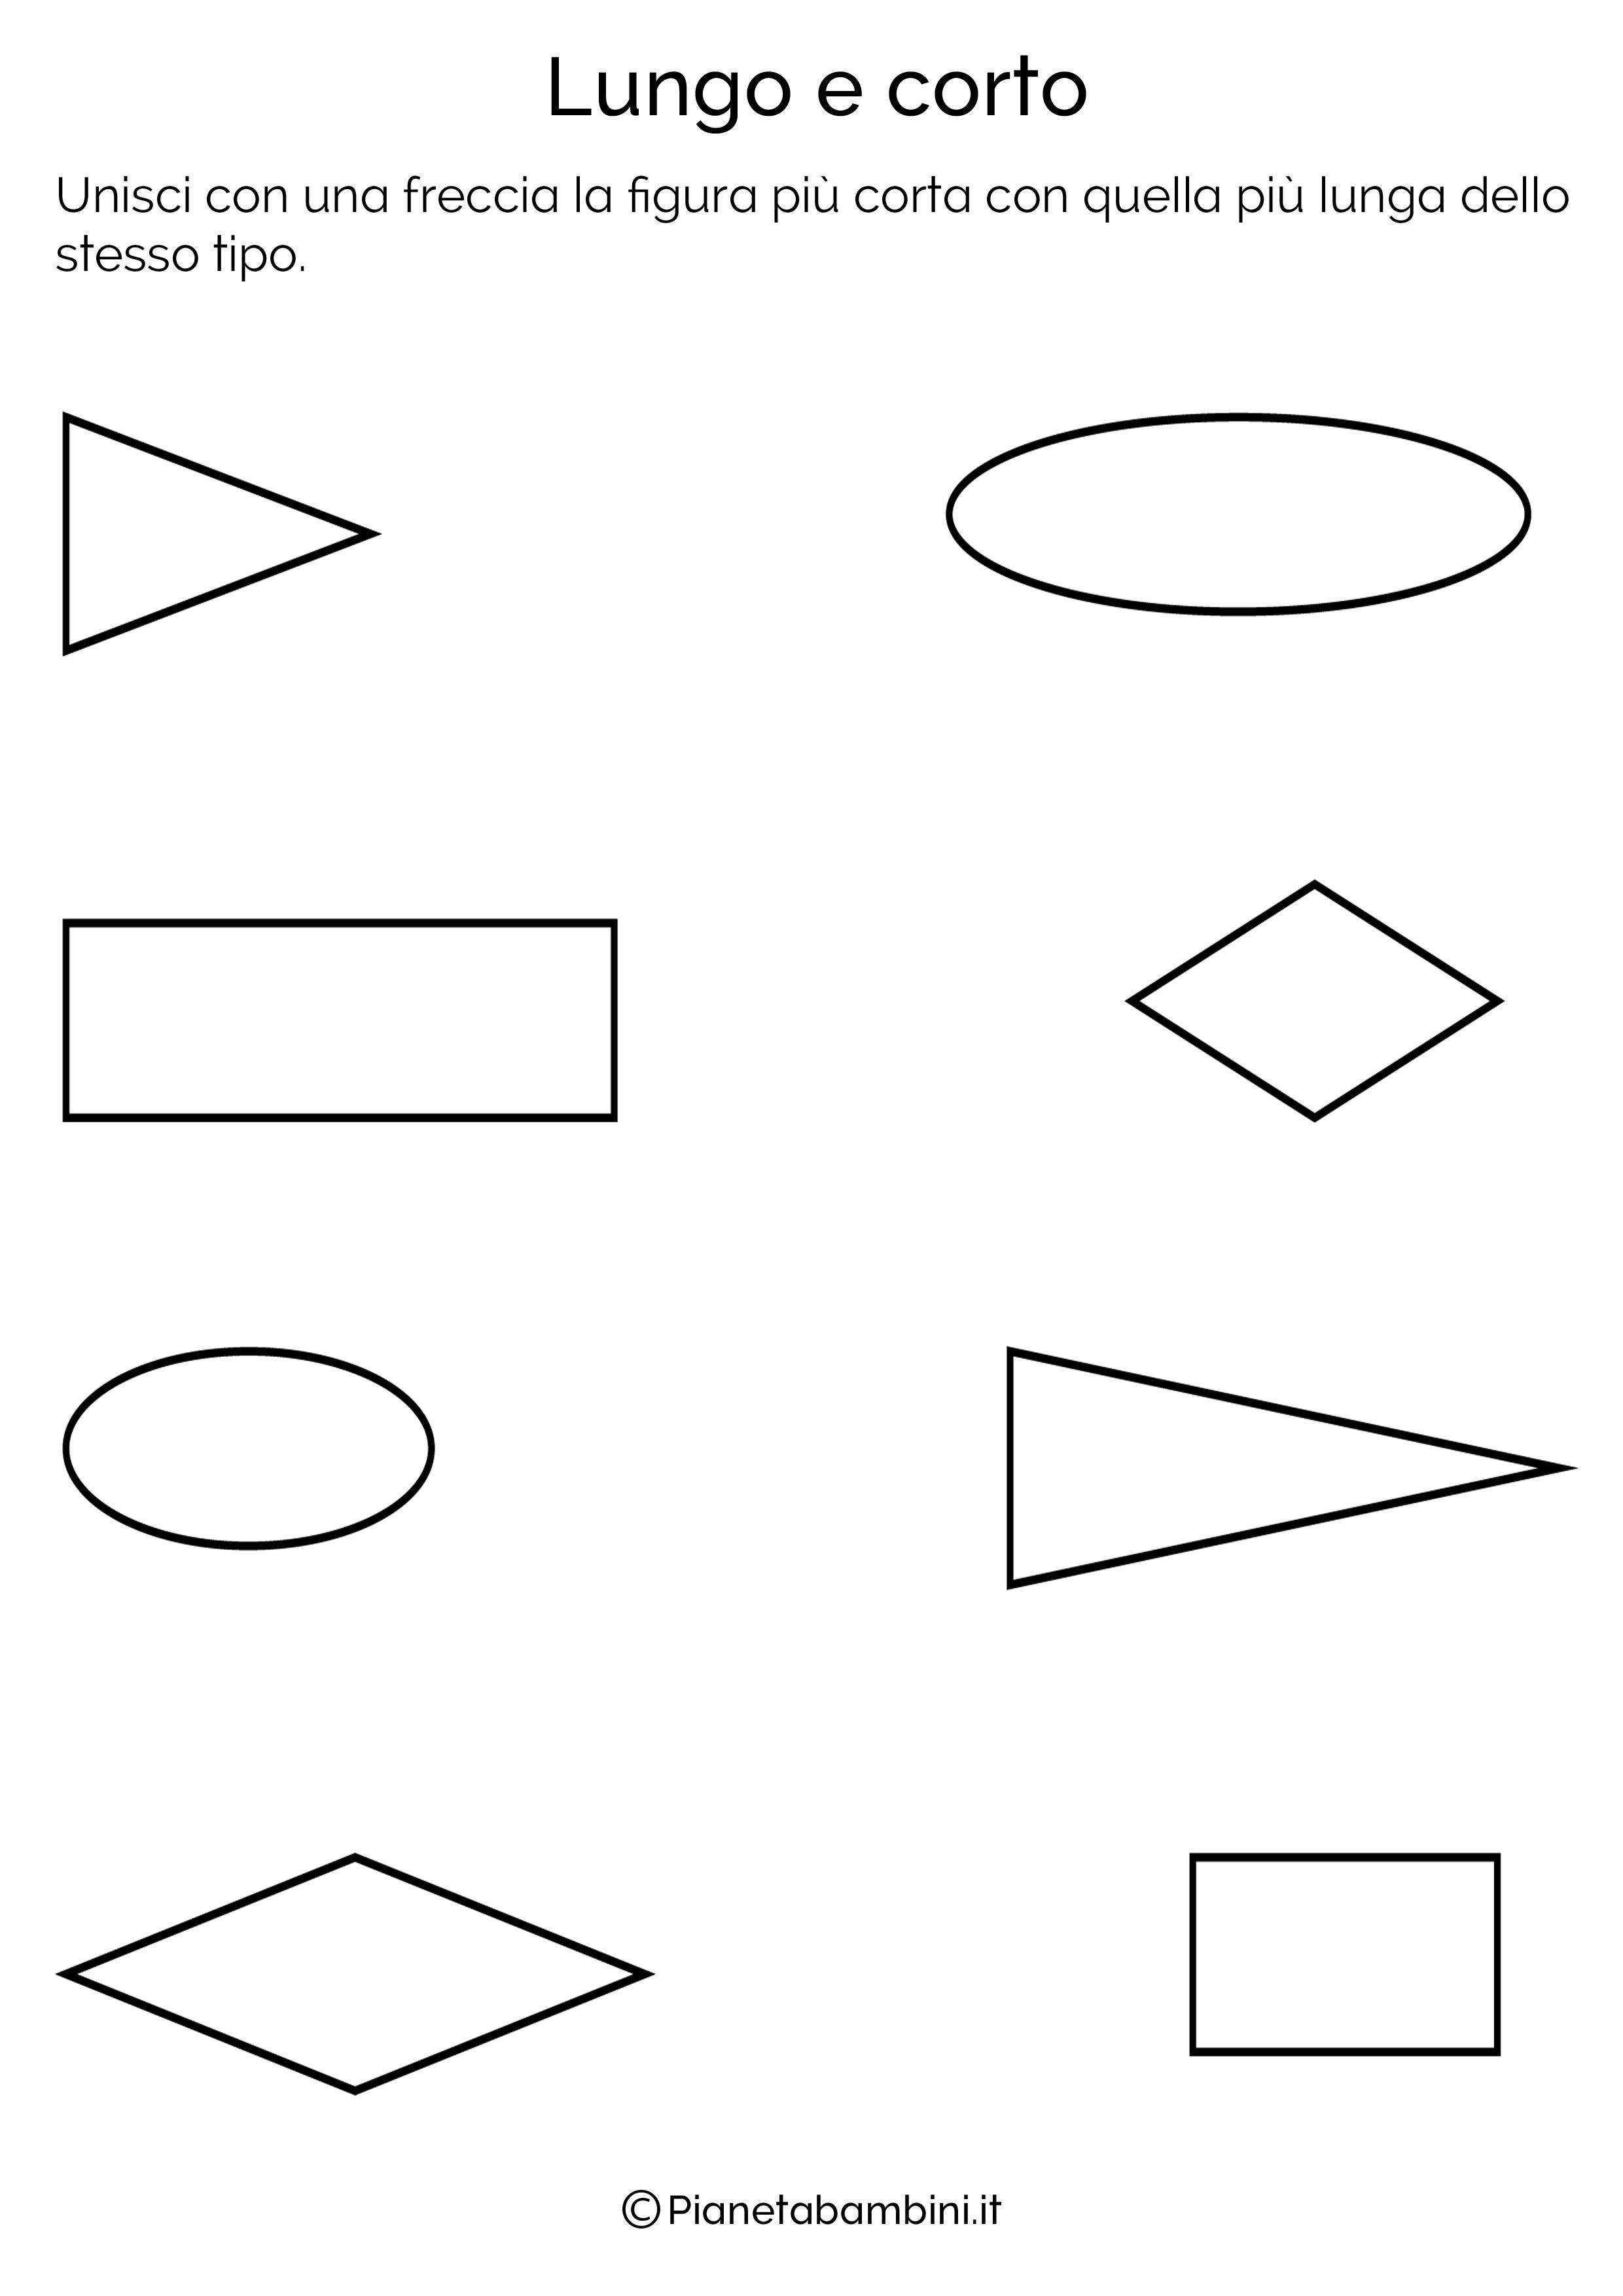 Esercizi-Oggetti-Lunghi-Corti-4